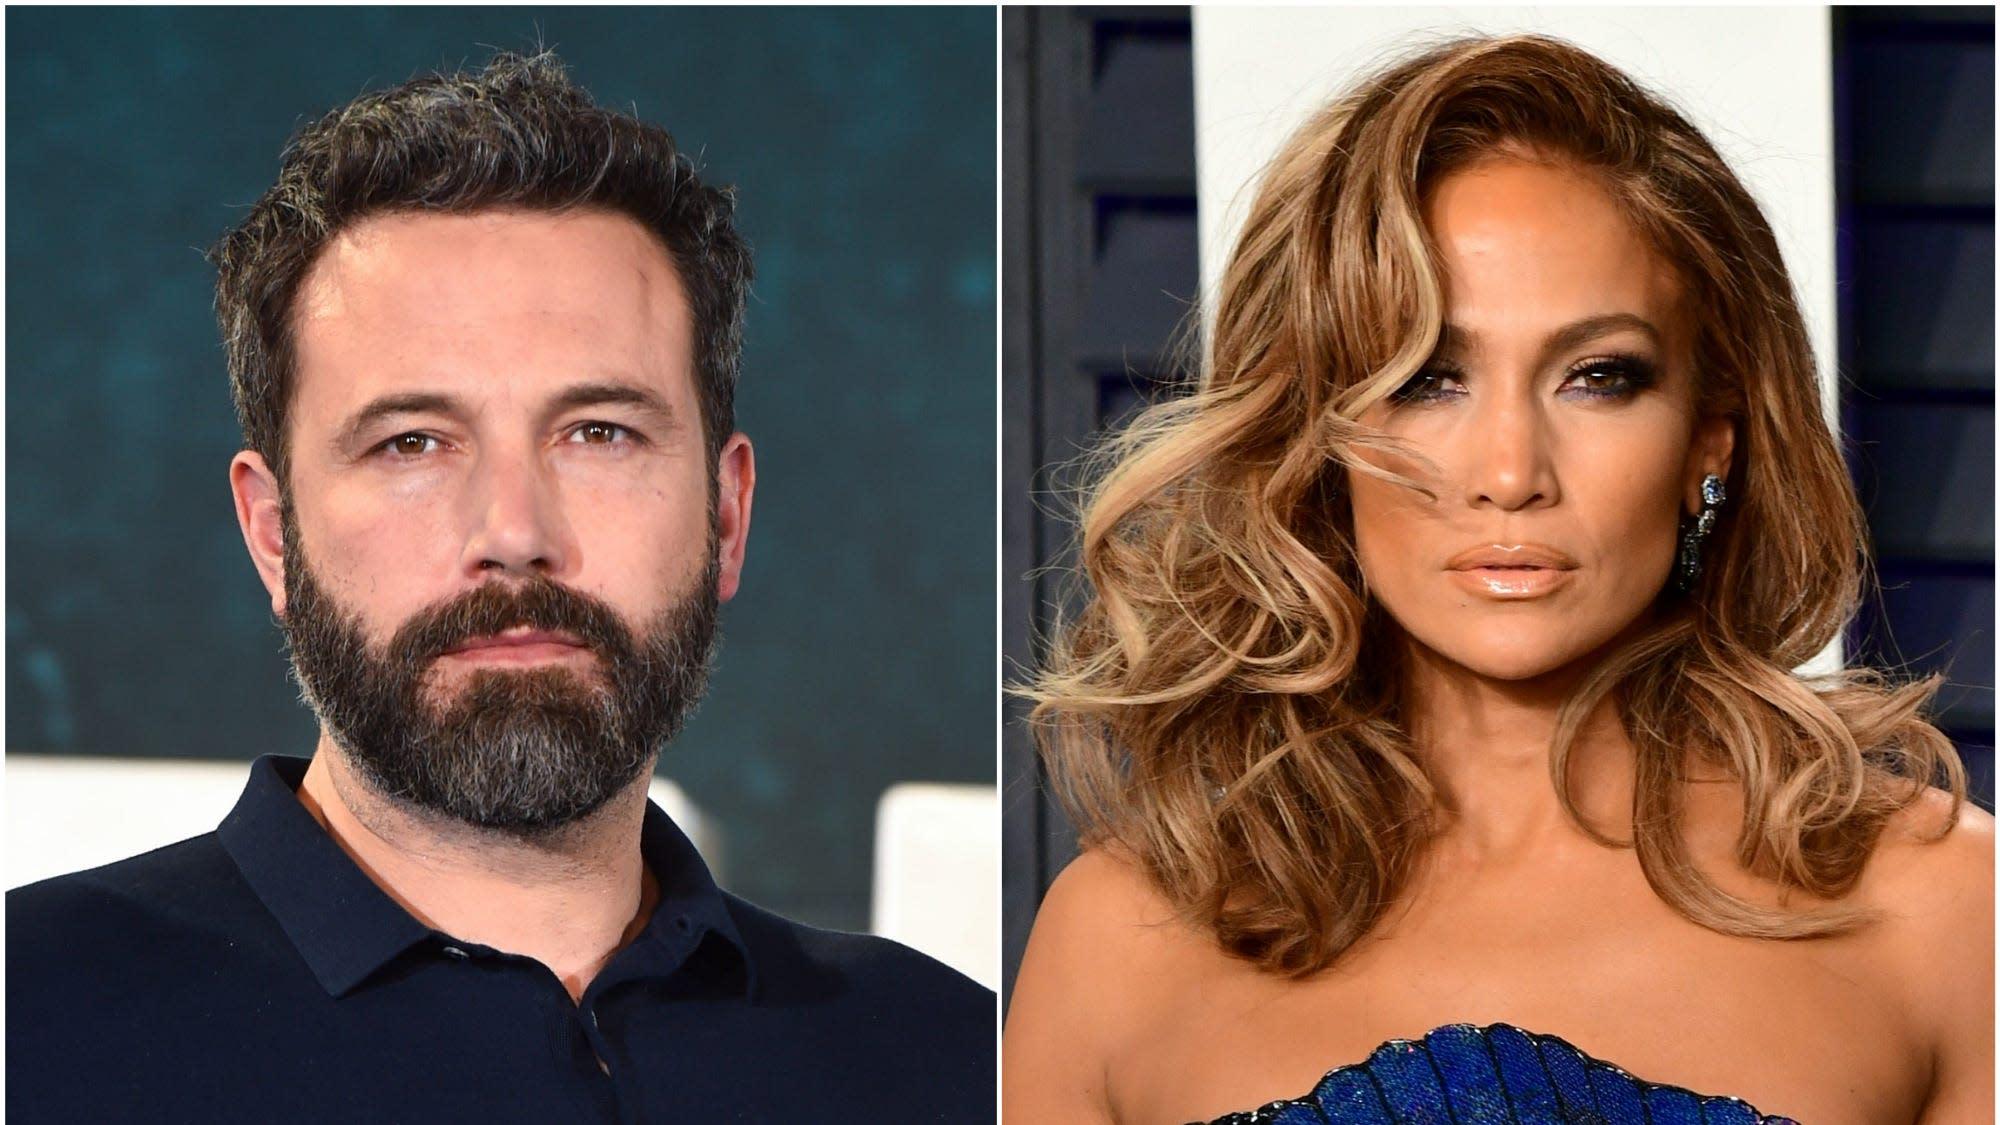 Ben Affleck praises ex Jennifer Lopez 17 years after their split